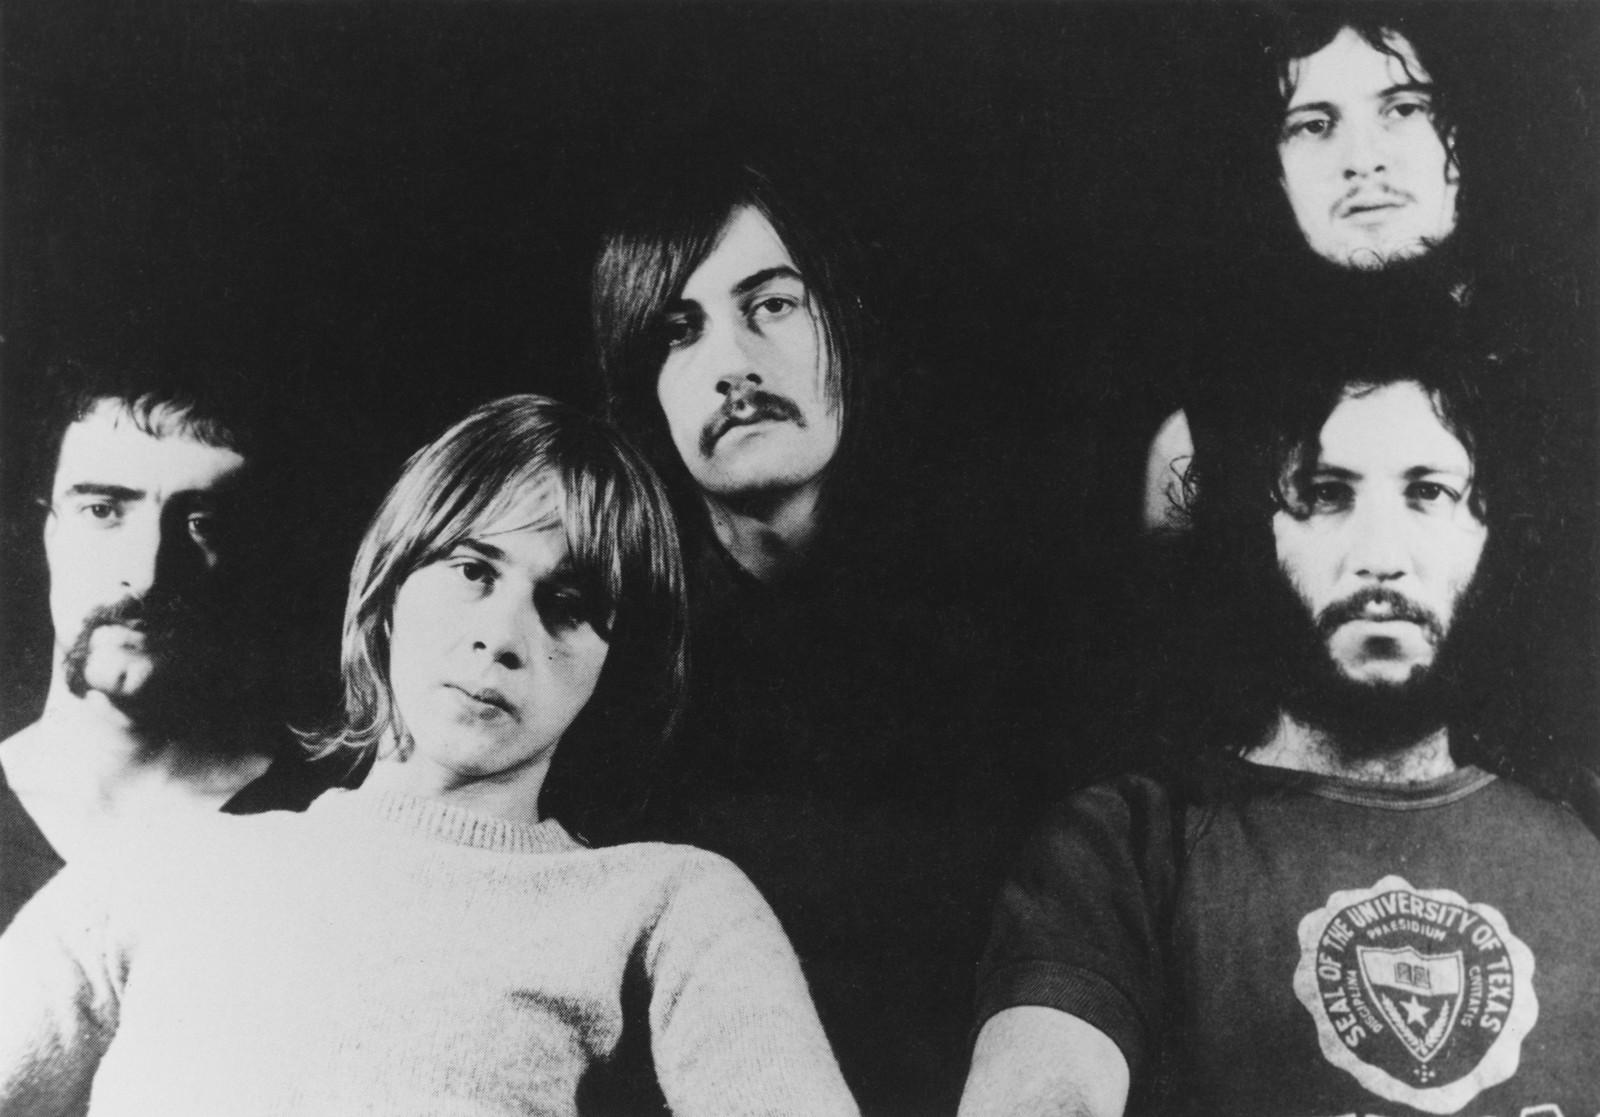 Danny-Kirwan-Fleetwood-Mac-1969-billboard